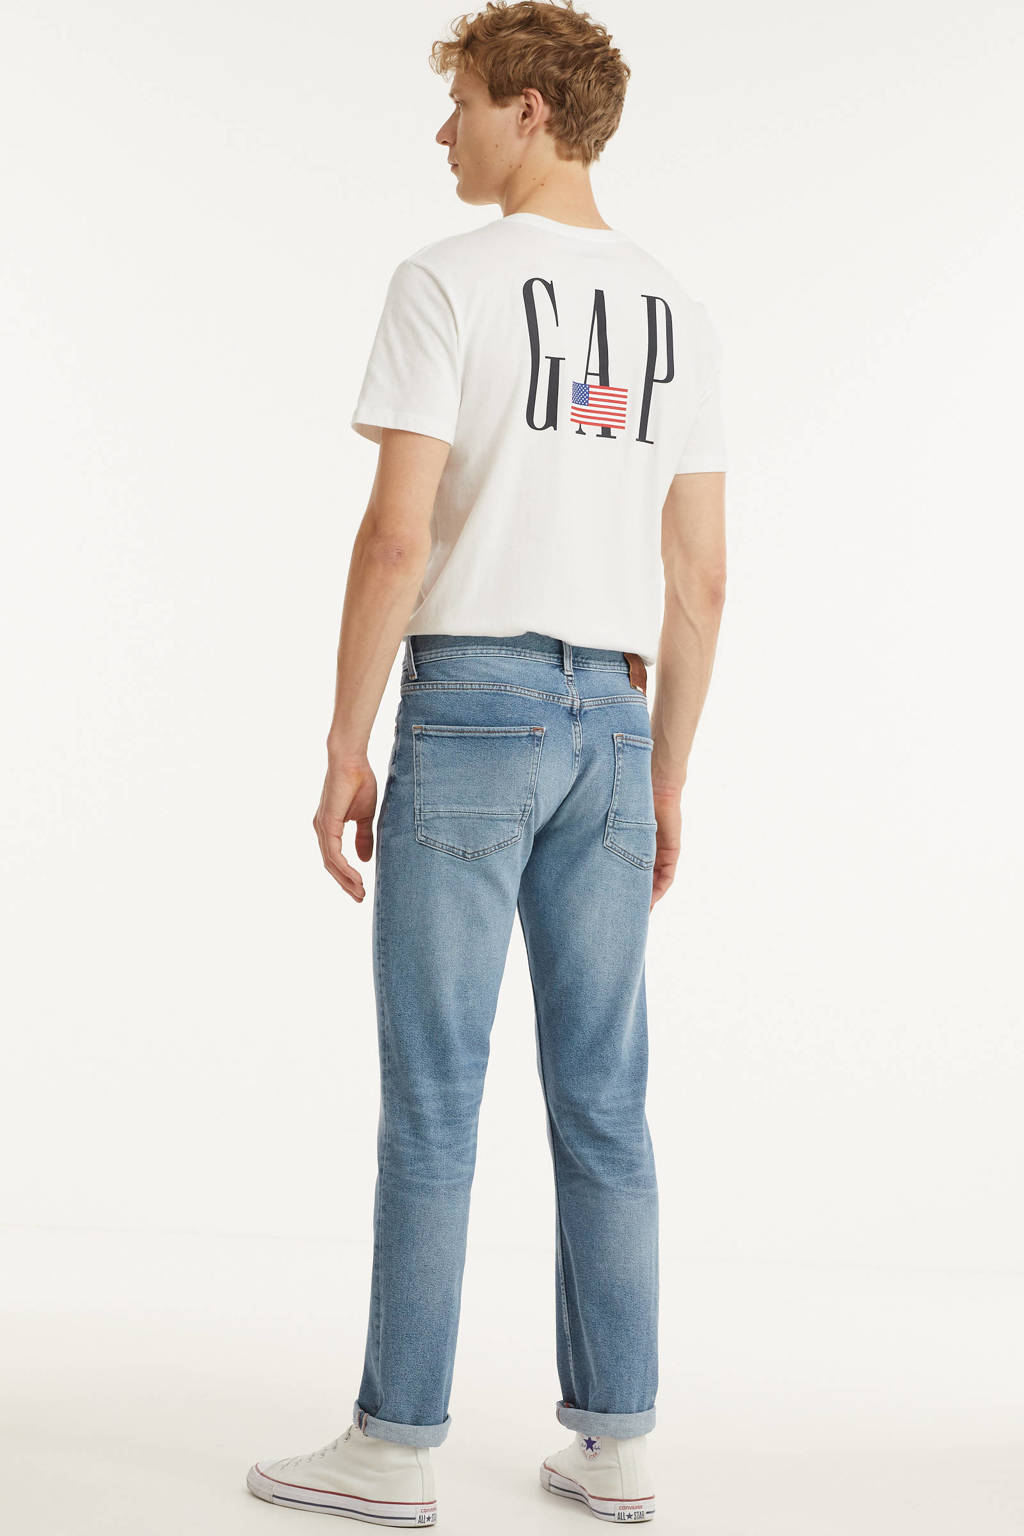 Tommy Hilfiger straight fit jeans Denton 1ab beacon indigo, 1AB Beacon Indigo